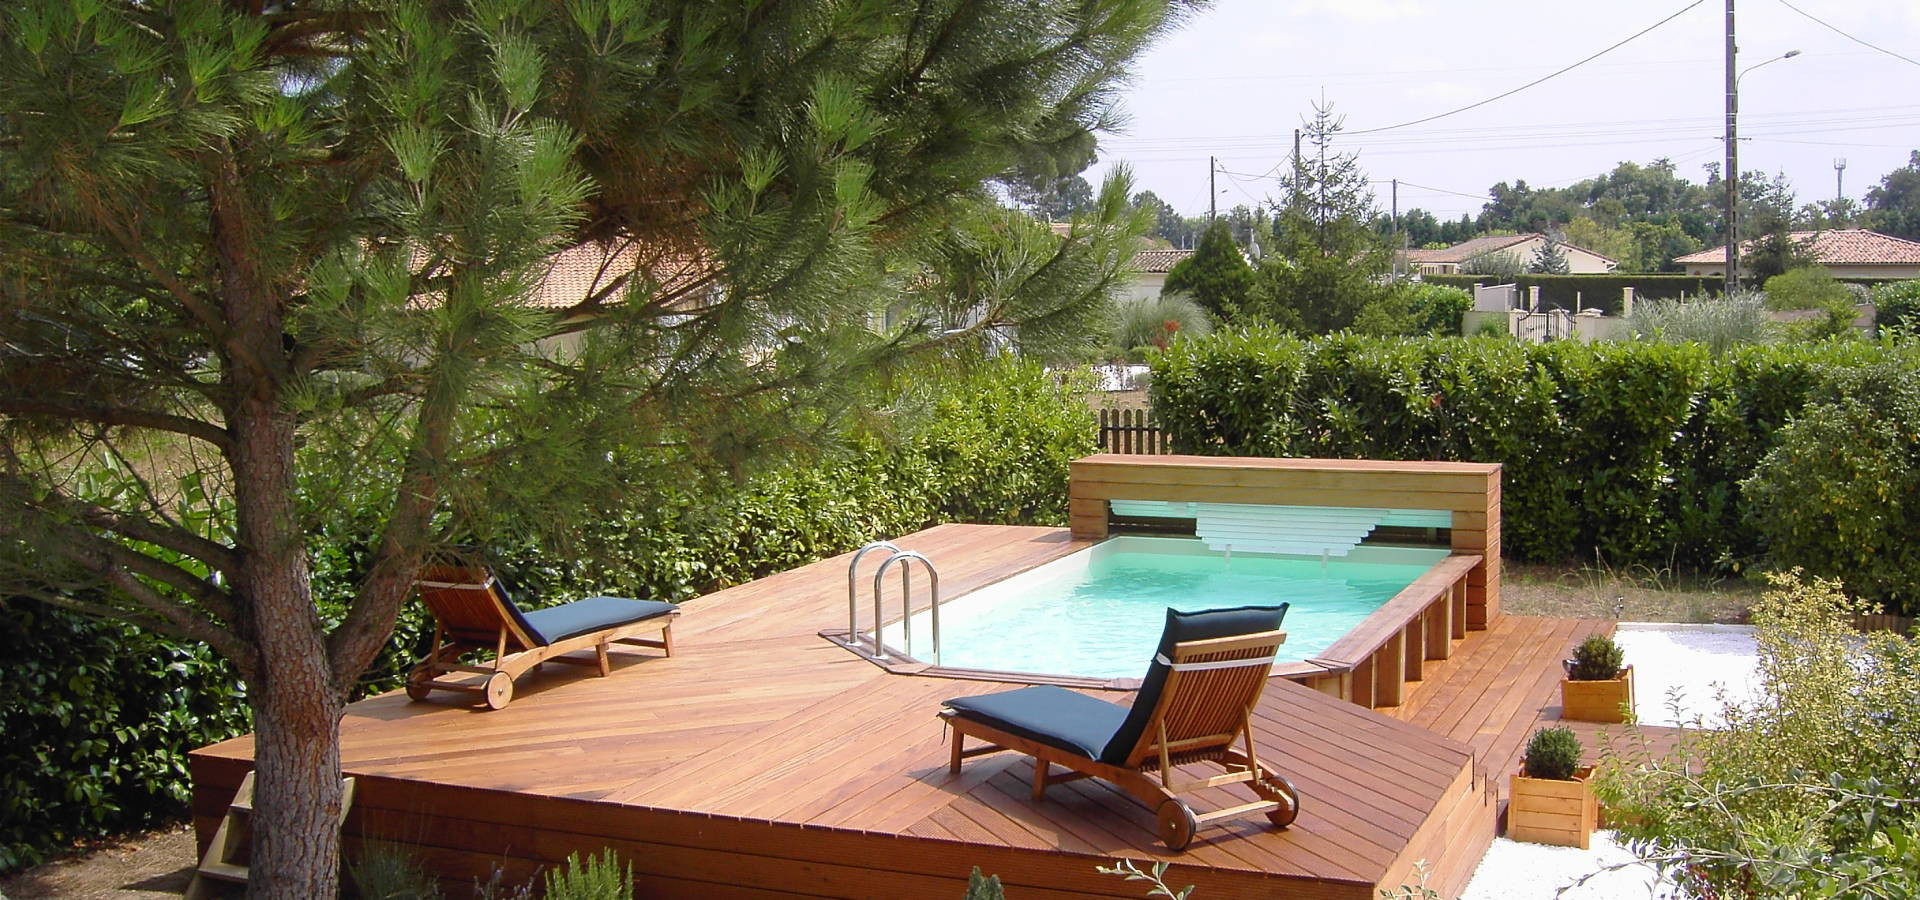 idee amenagement jardin avec piscine hors sol Archives